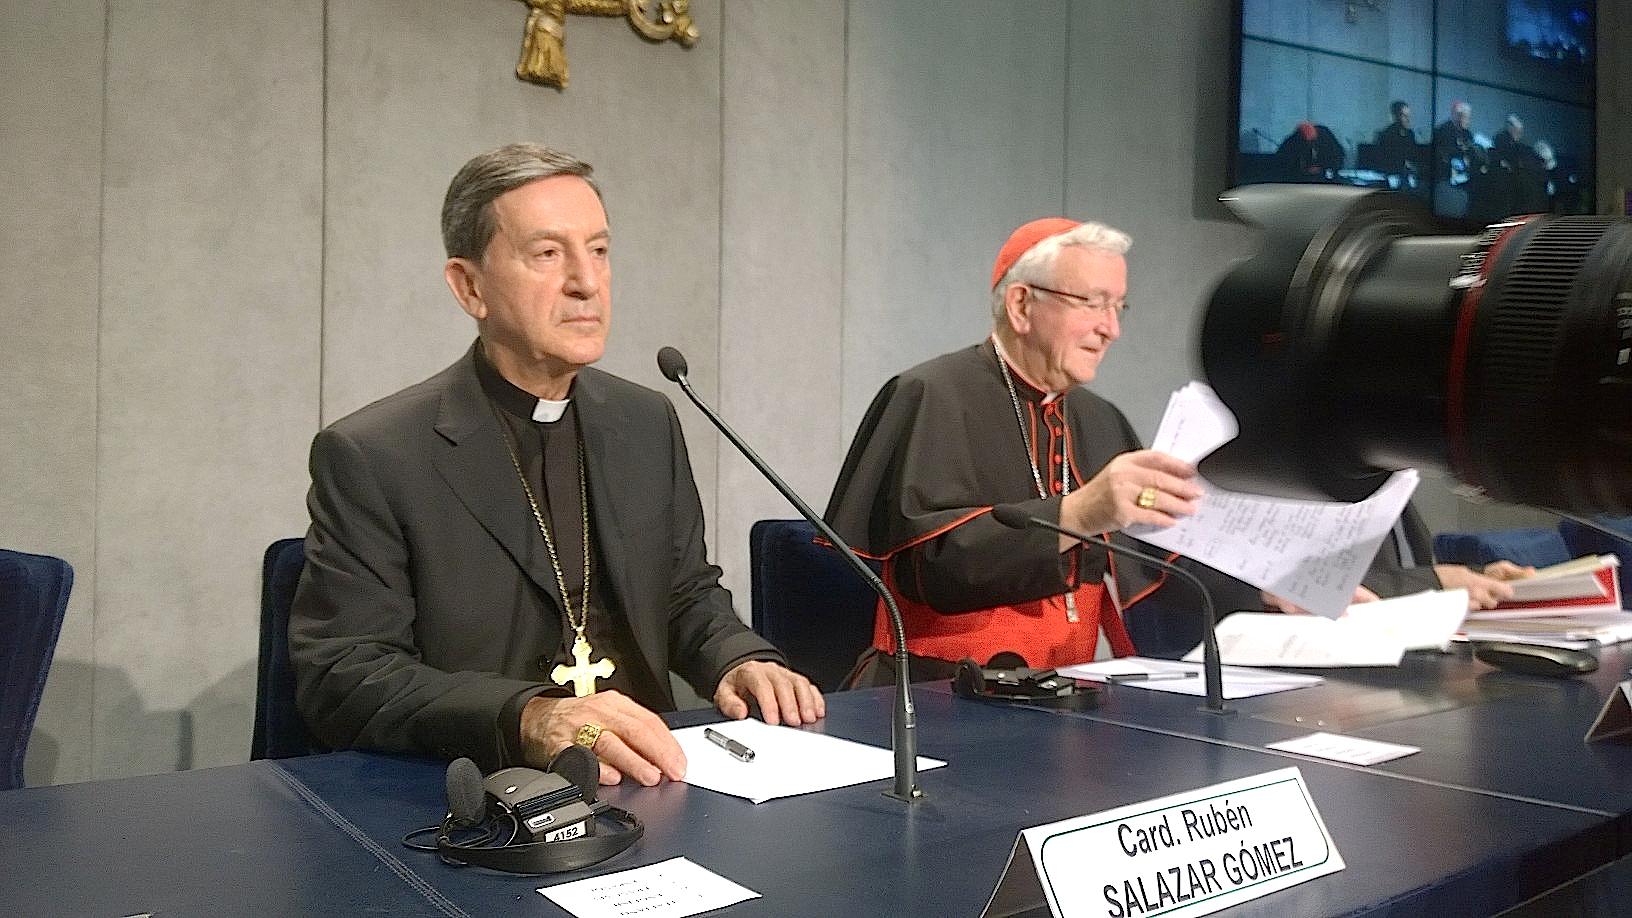 Cardinal NIchols and Salazar - Briefing 14 October 2015